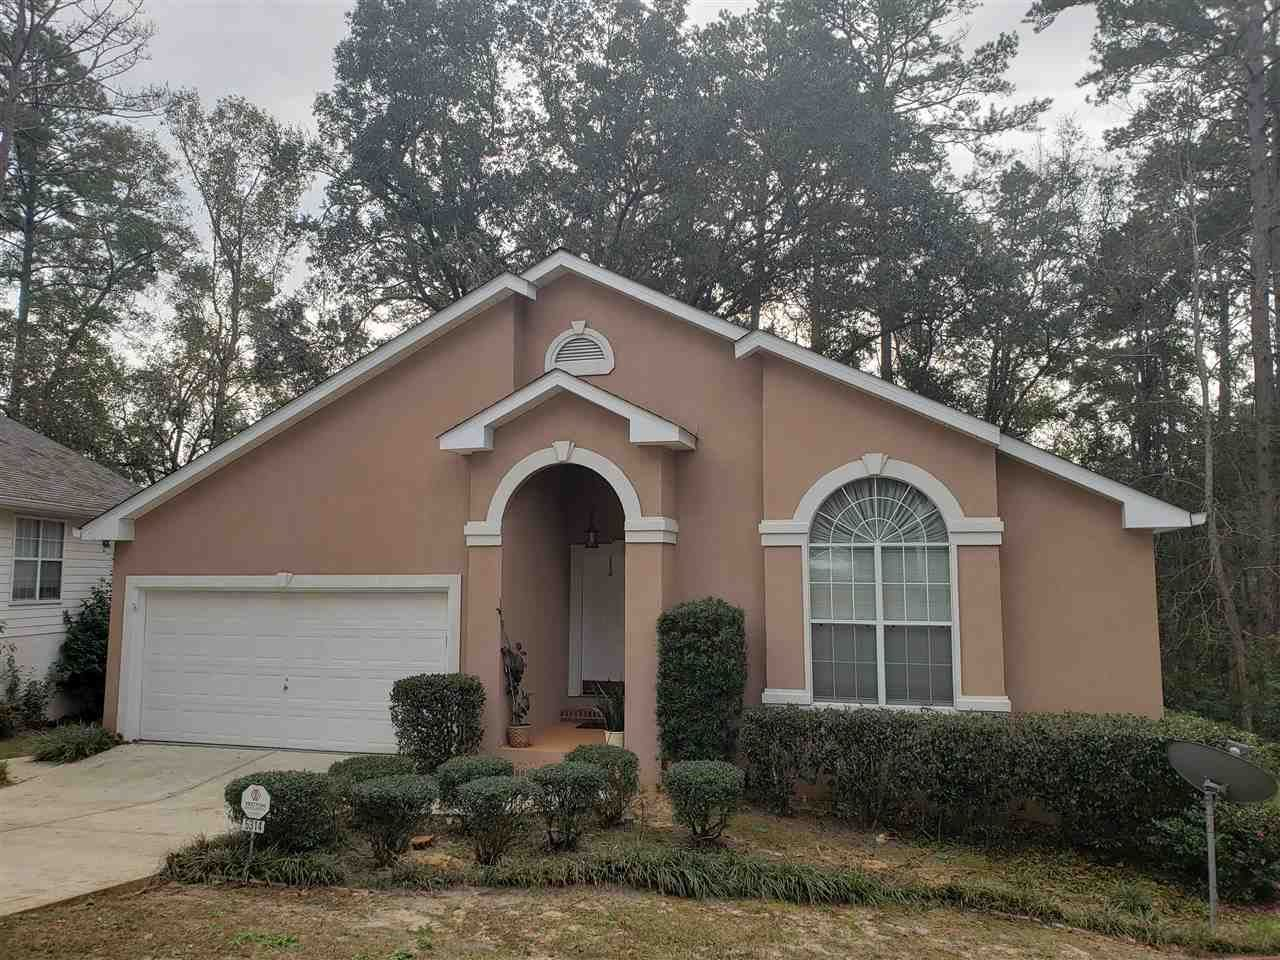 Photo for 5314 Saint Ives Lane, TALLAHASSEE, FL 32309 (MLS # 326018)